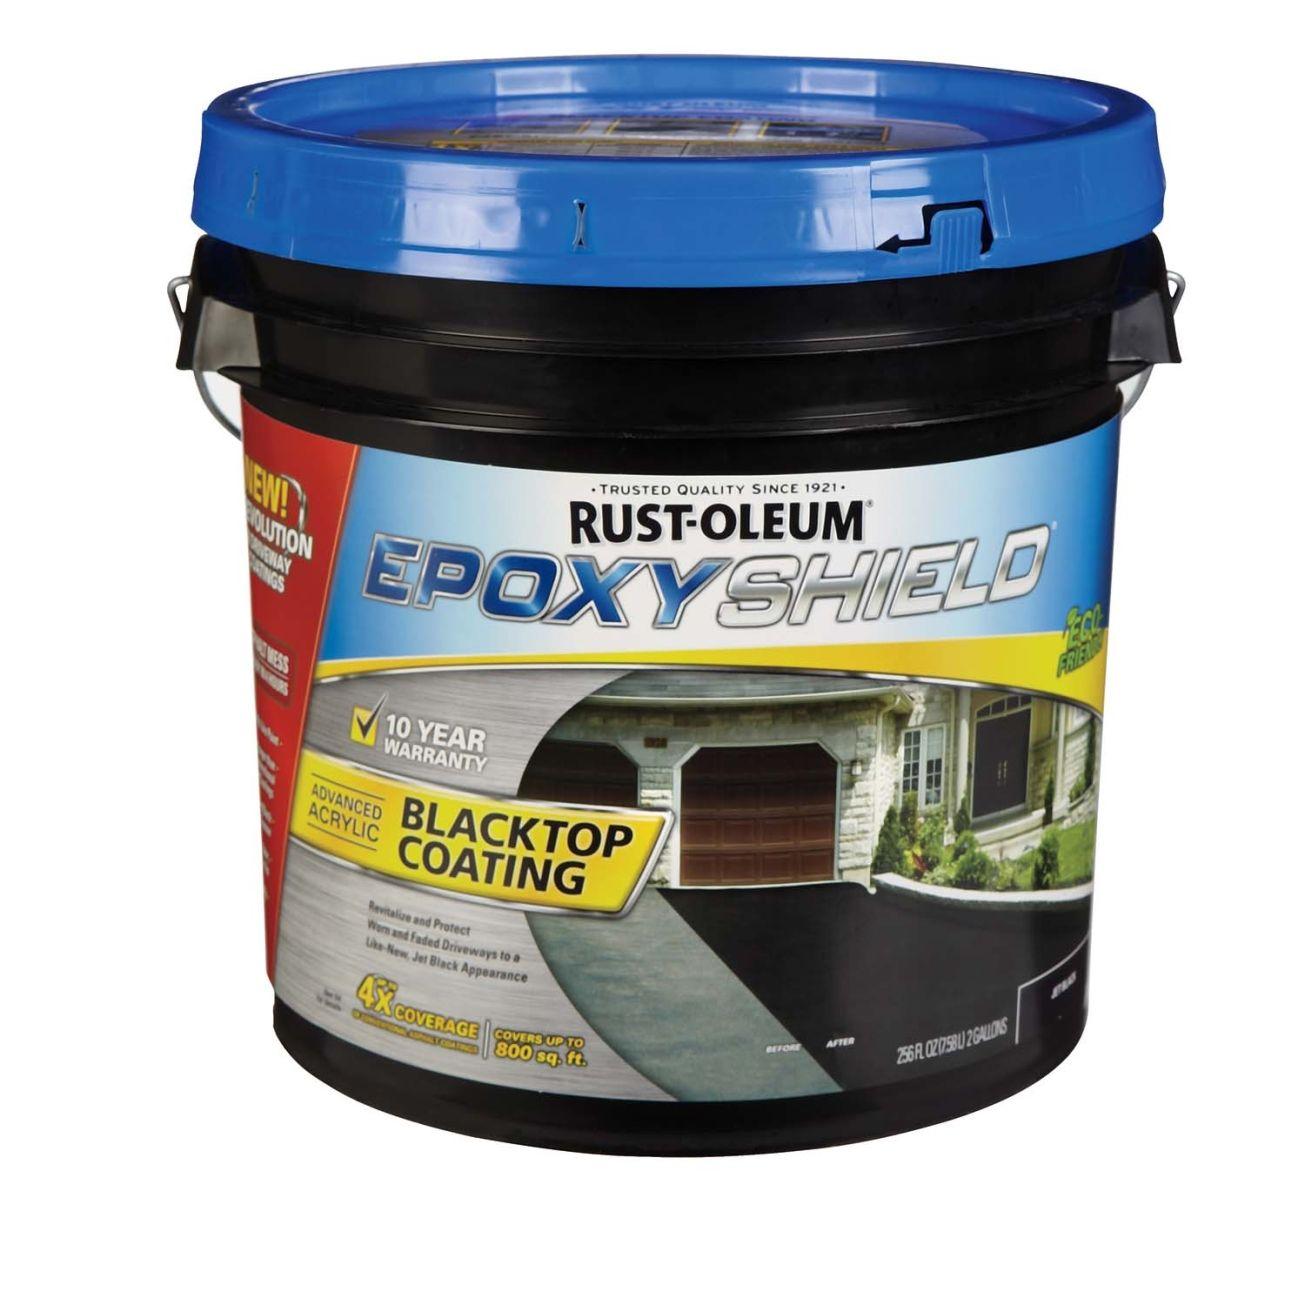 Rust Oleum Epoxy Shield Blacktop Coating 247471 Driveway Sealers Ace Hardware Driveway Sealer Rustoleum Sealer